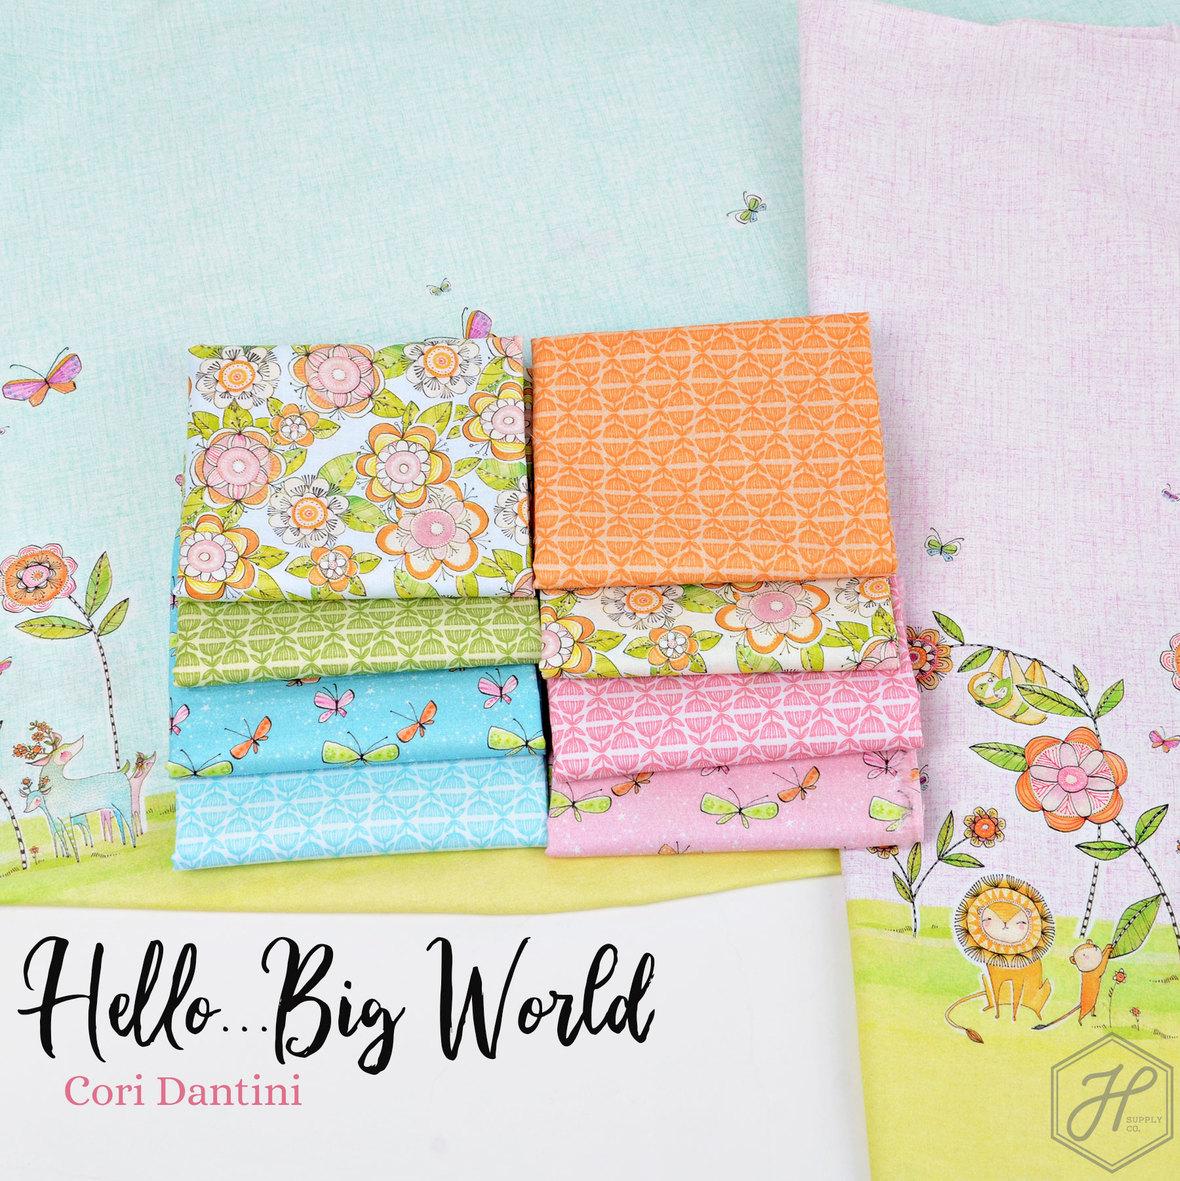 Hello-Big-World-Fabric-Cori-Dantini-for-Hawthorne-Supply-Co